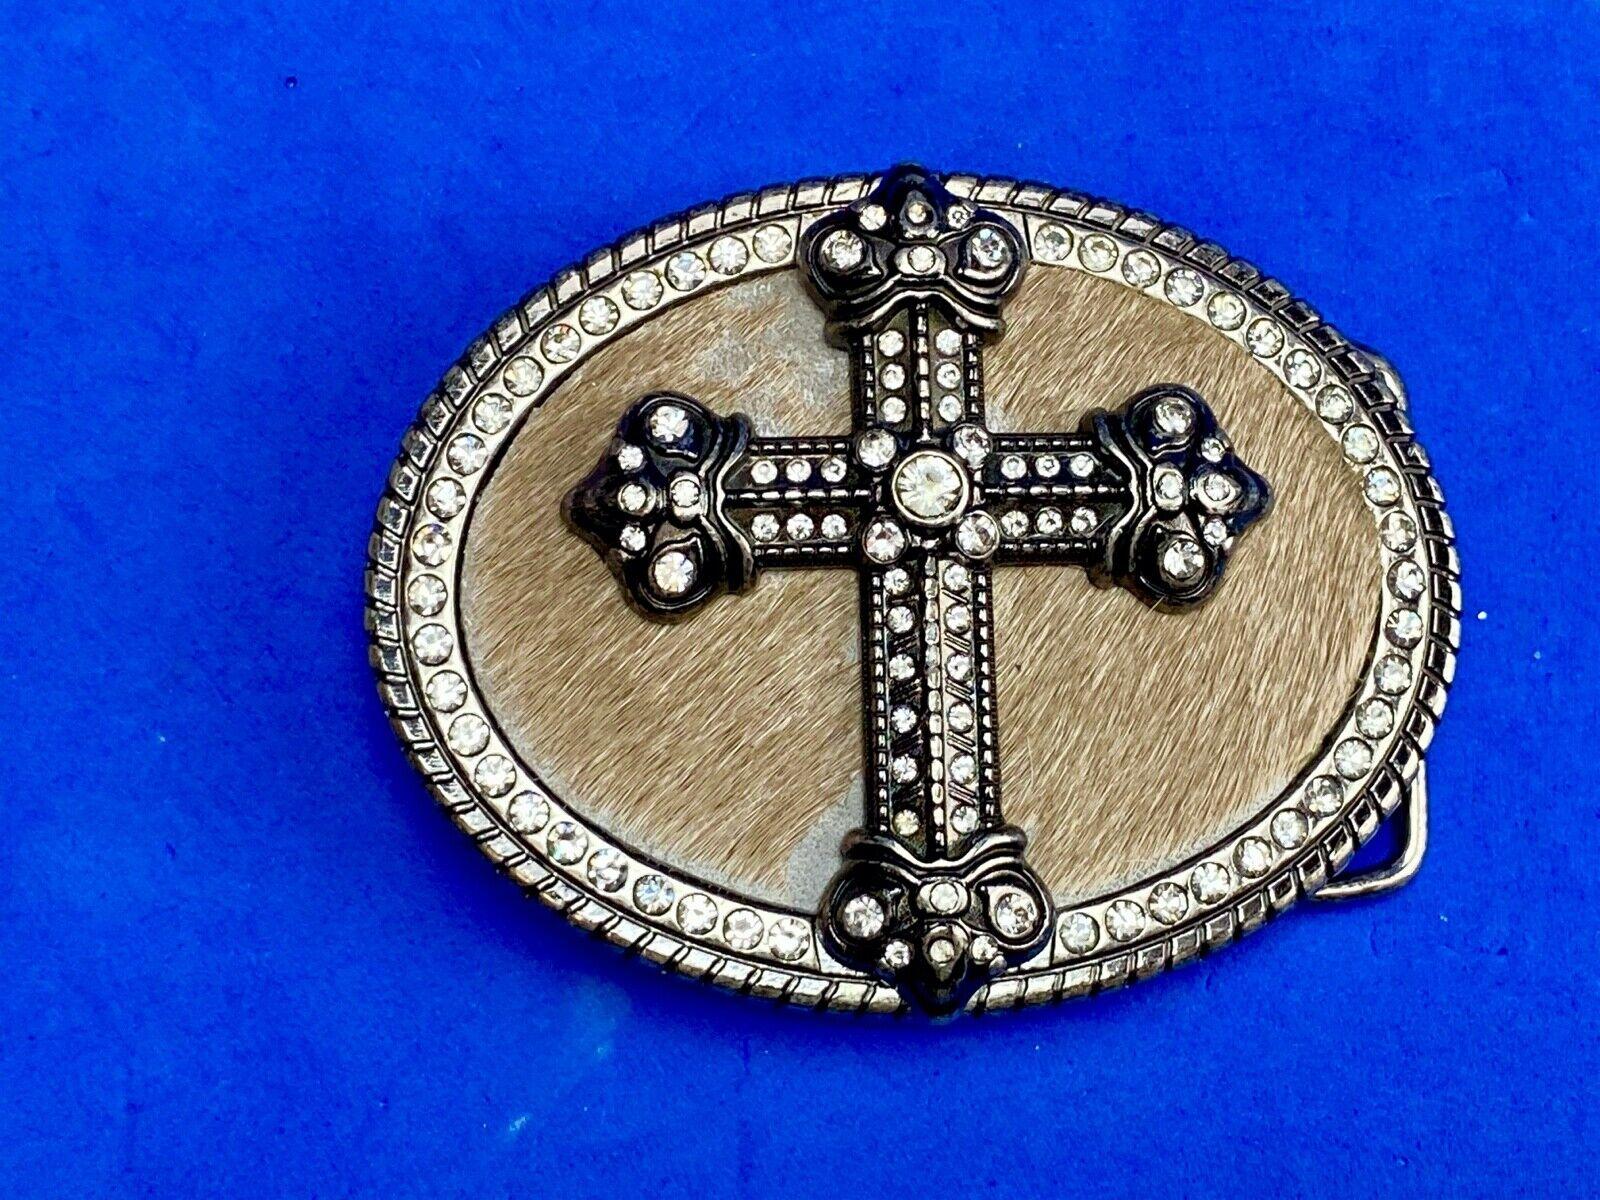 Western oval CROSS belt buckle with faux Hyde animal fur & rhinestone background